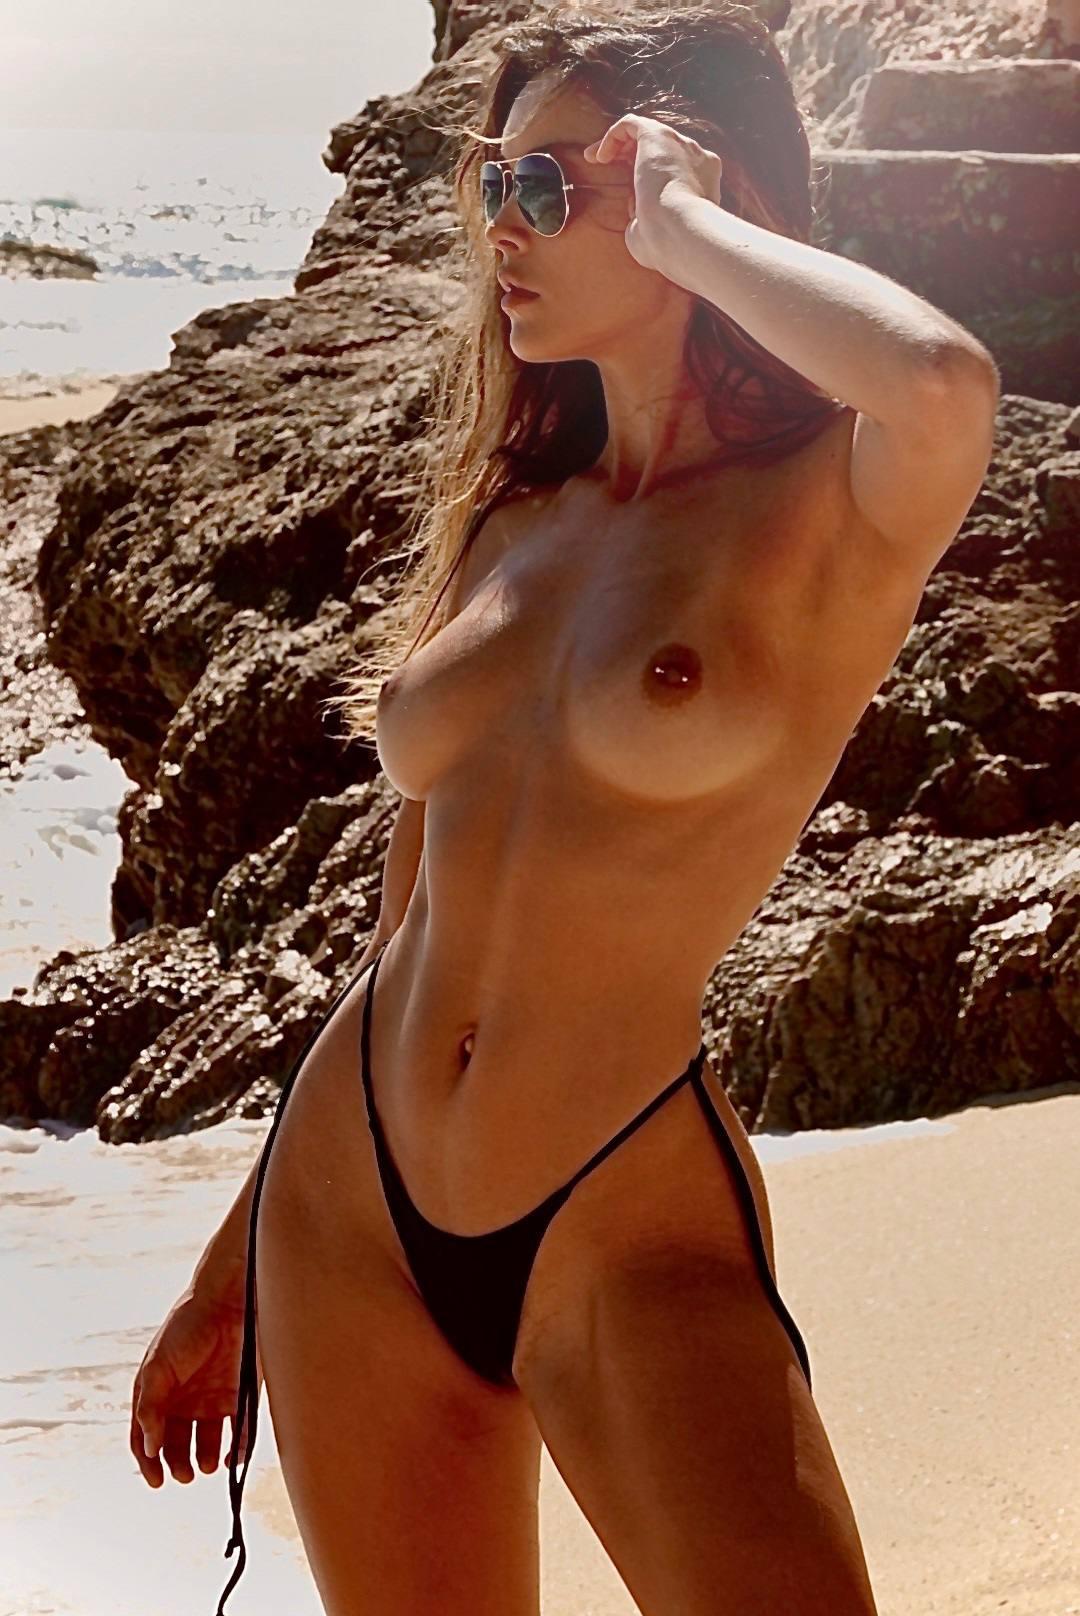 Cherokee Luker – Sexy Boobs In Beautiful Topless Photoshoot By Josh Ryan (nsfw) 0014